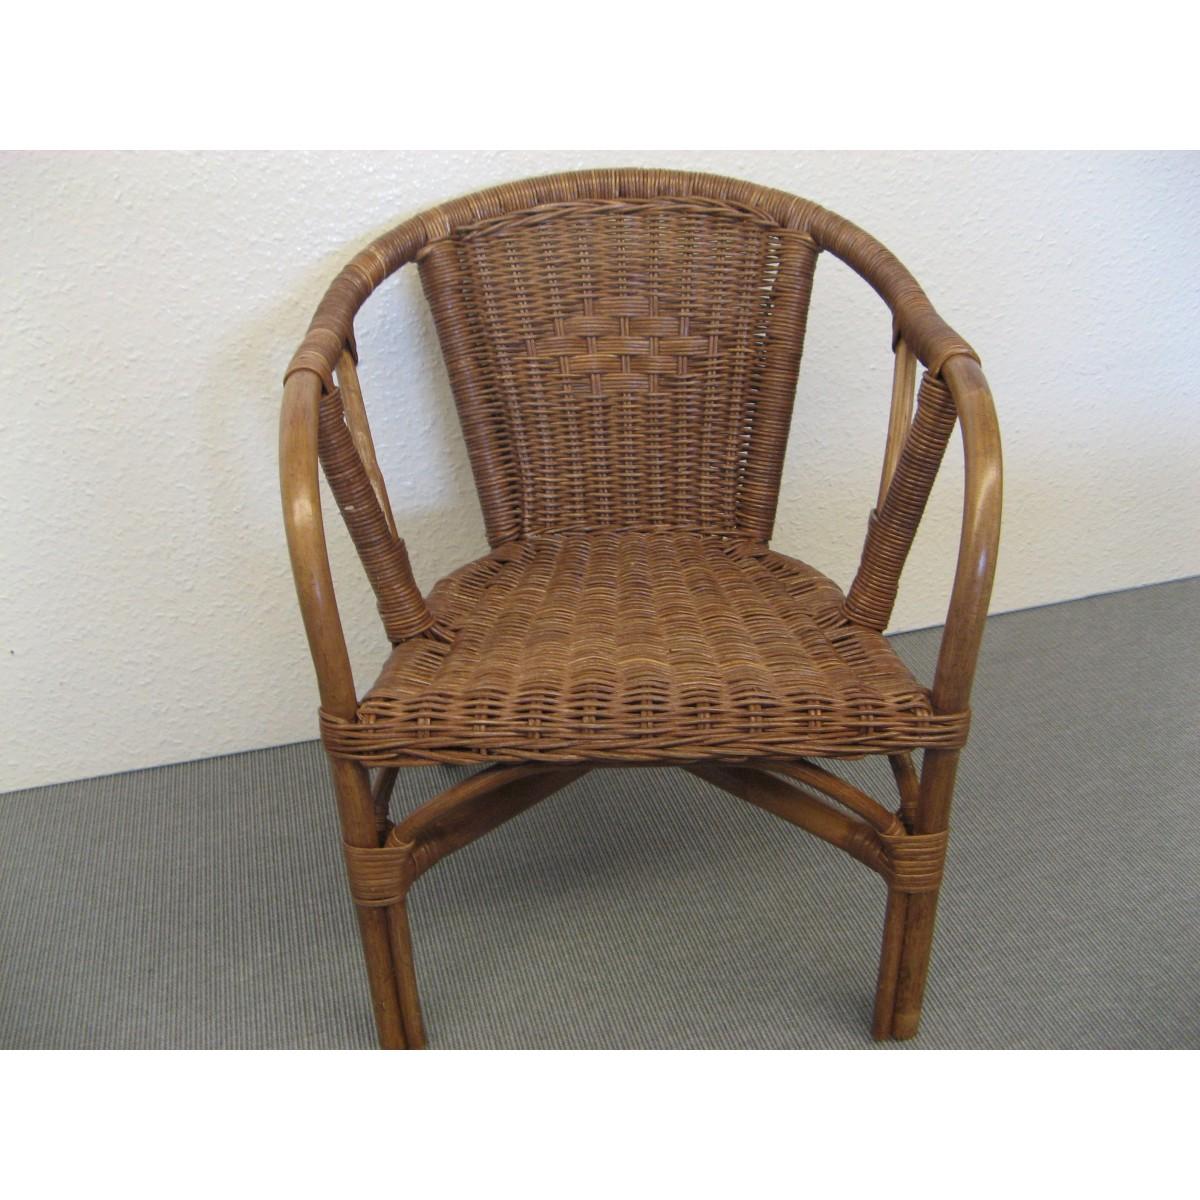 fauteuil d 39 enfant edgar en rotin coloris brun. Black Bedroom Furniture Sets. Home Design Ideas